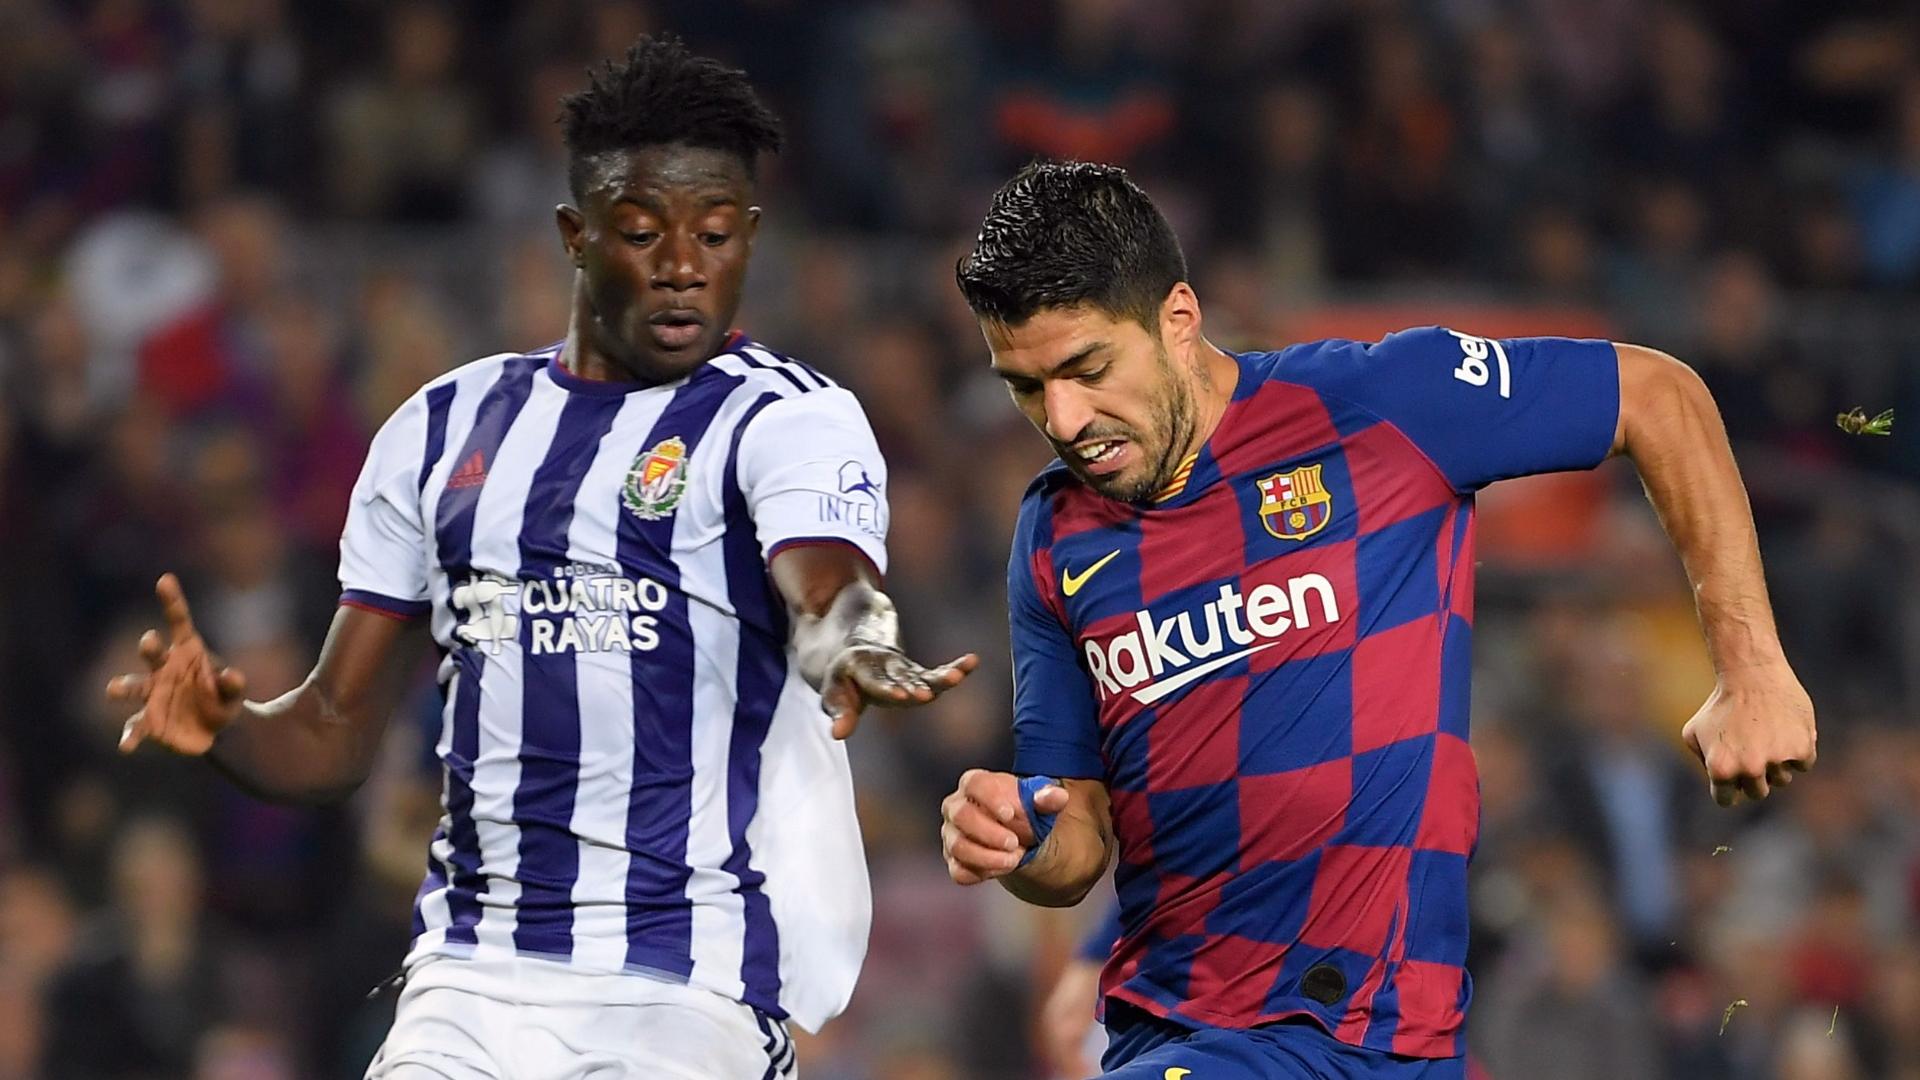 Ghana defender Salisu wants to leave Rennes for the Premier League